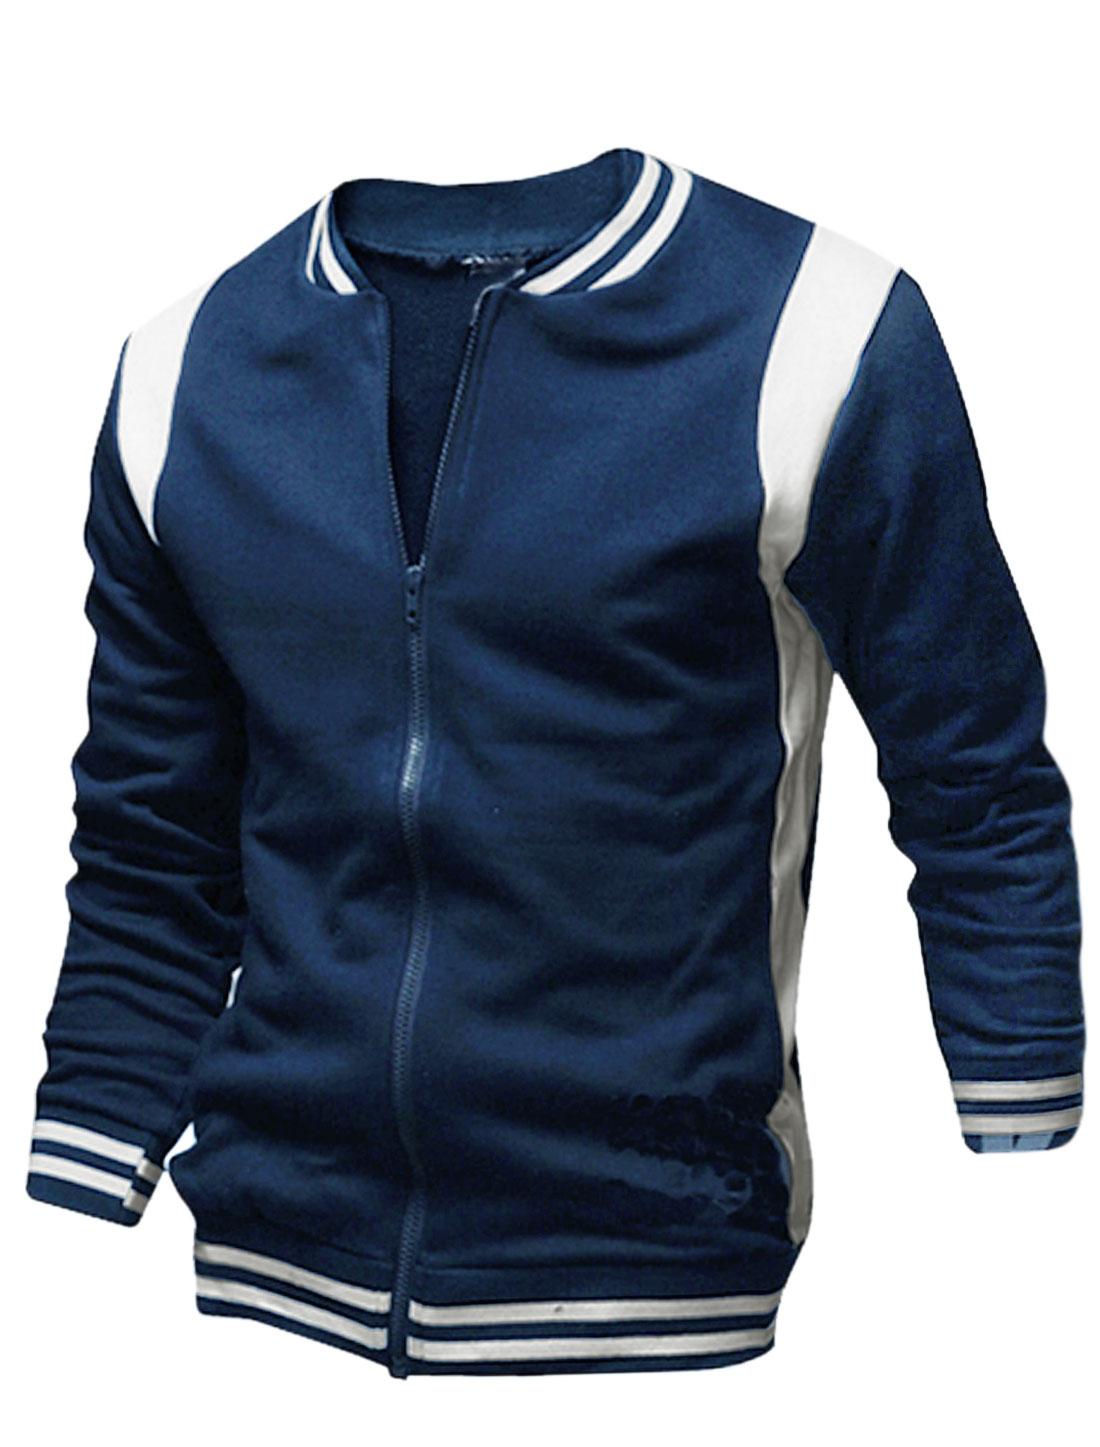 Men Contrast Color Stand Collar Ribbed Trim Baseball Jacket Navy Blue M